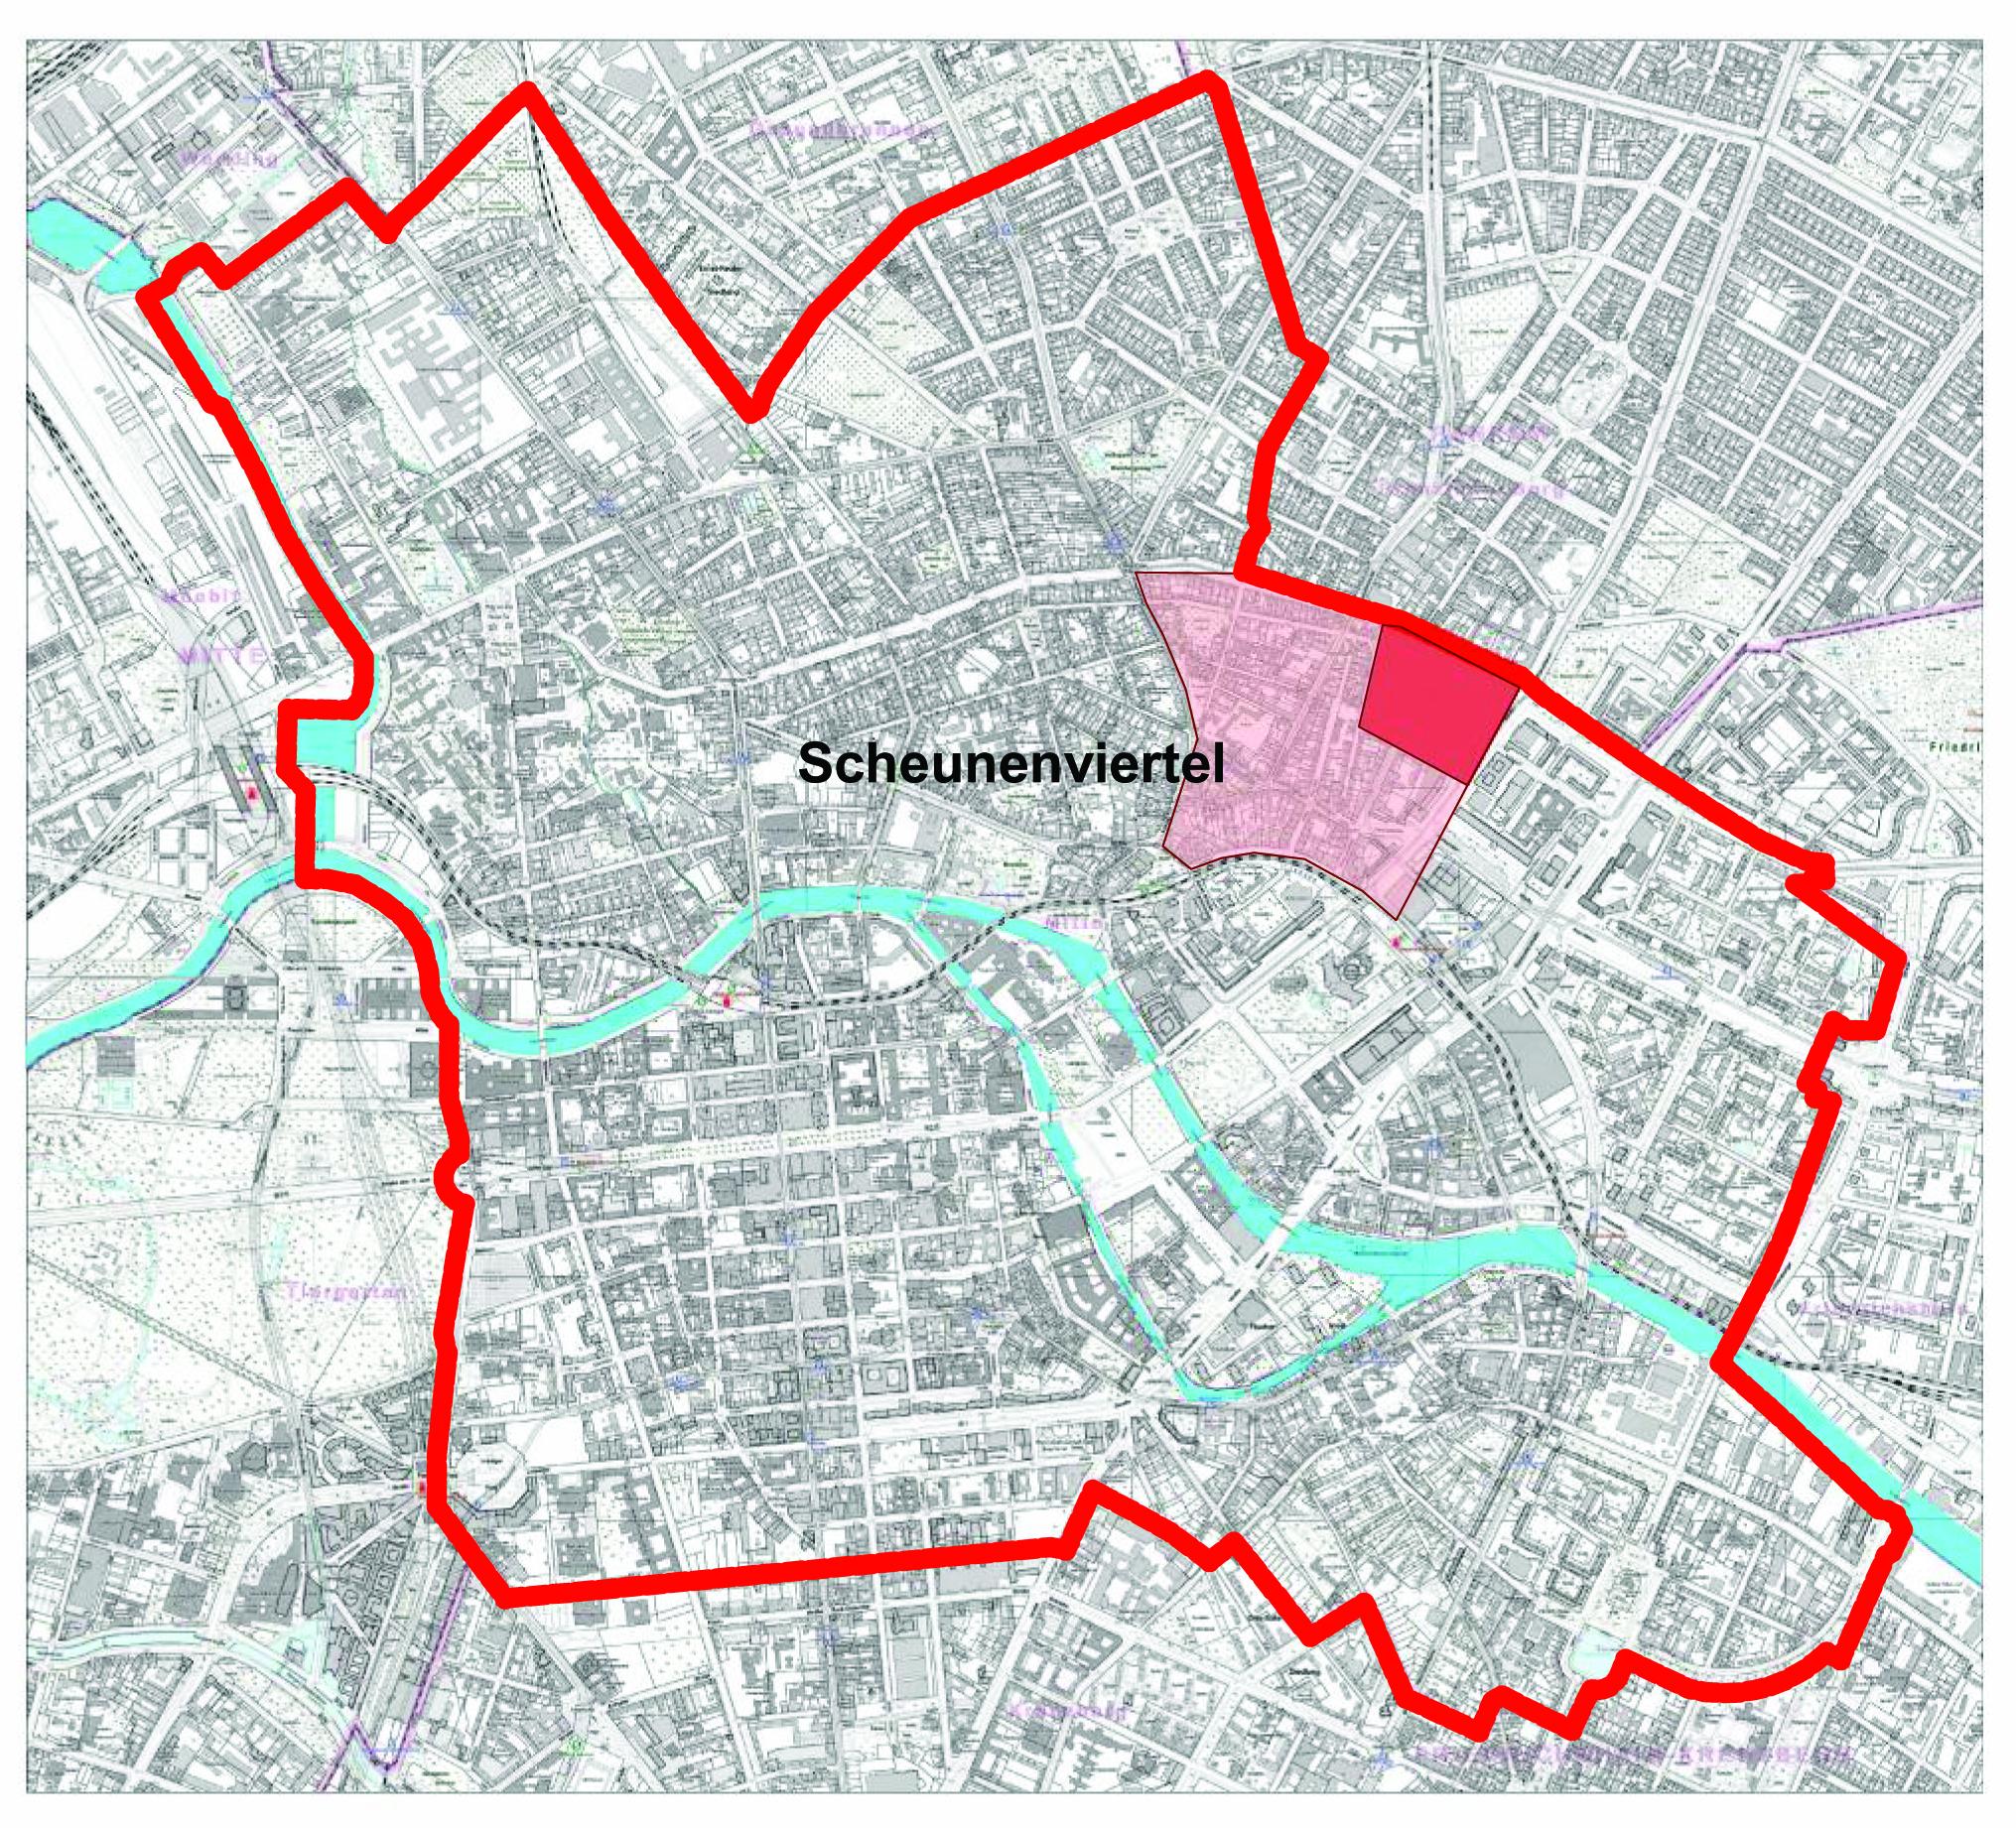 File Bma Scheunenviertel Berlin Mitte Jpg Wikimedia Commons